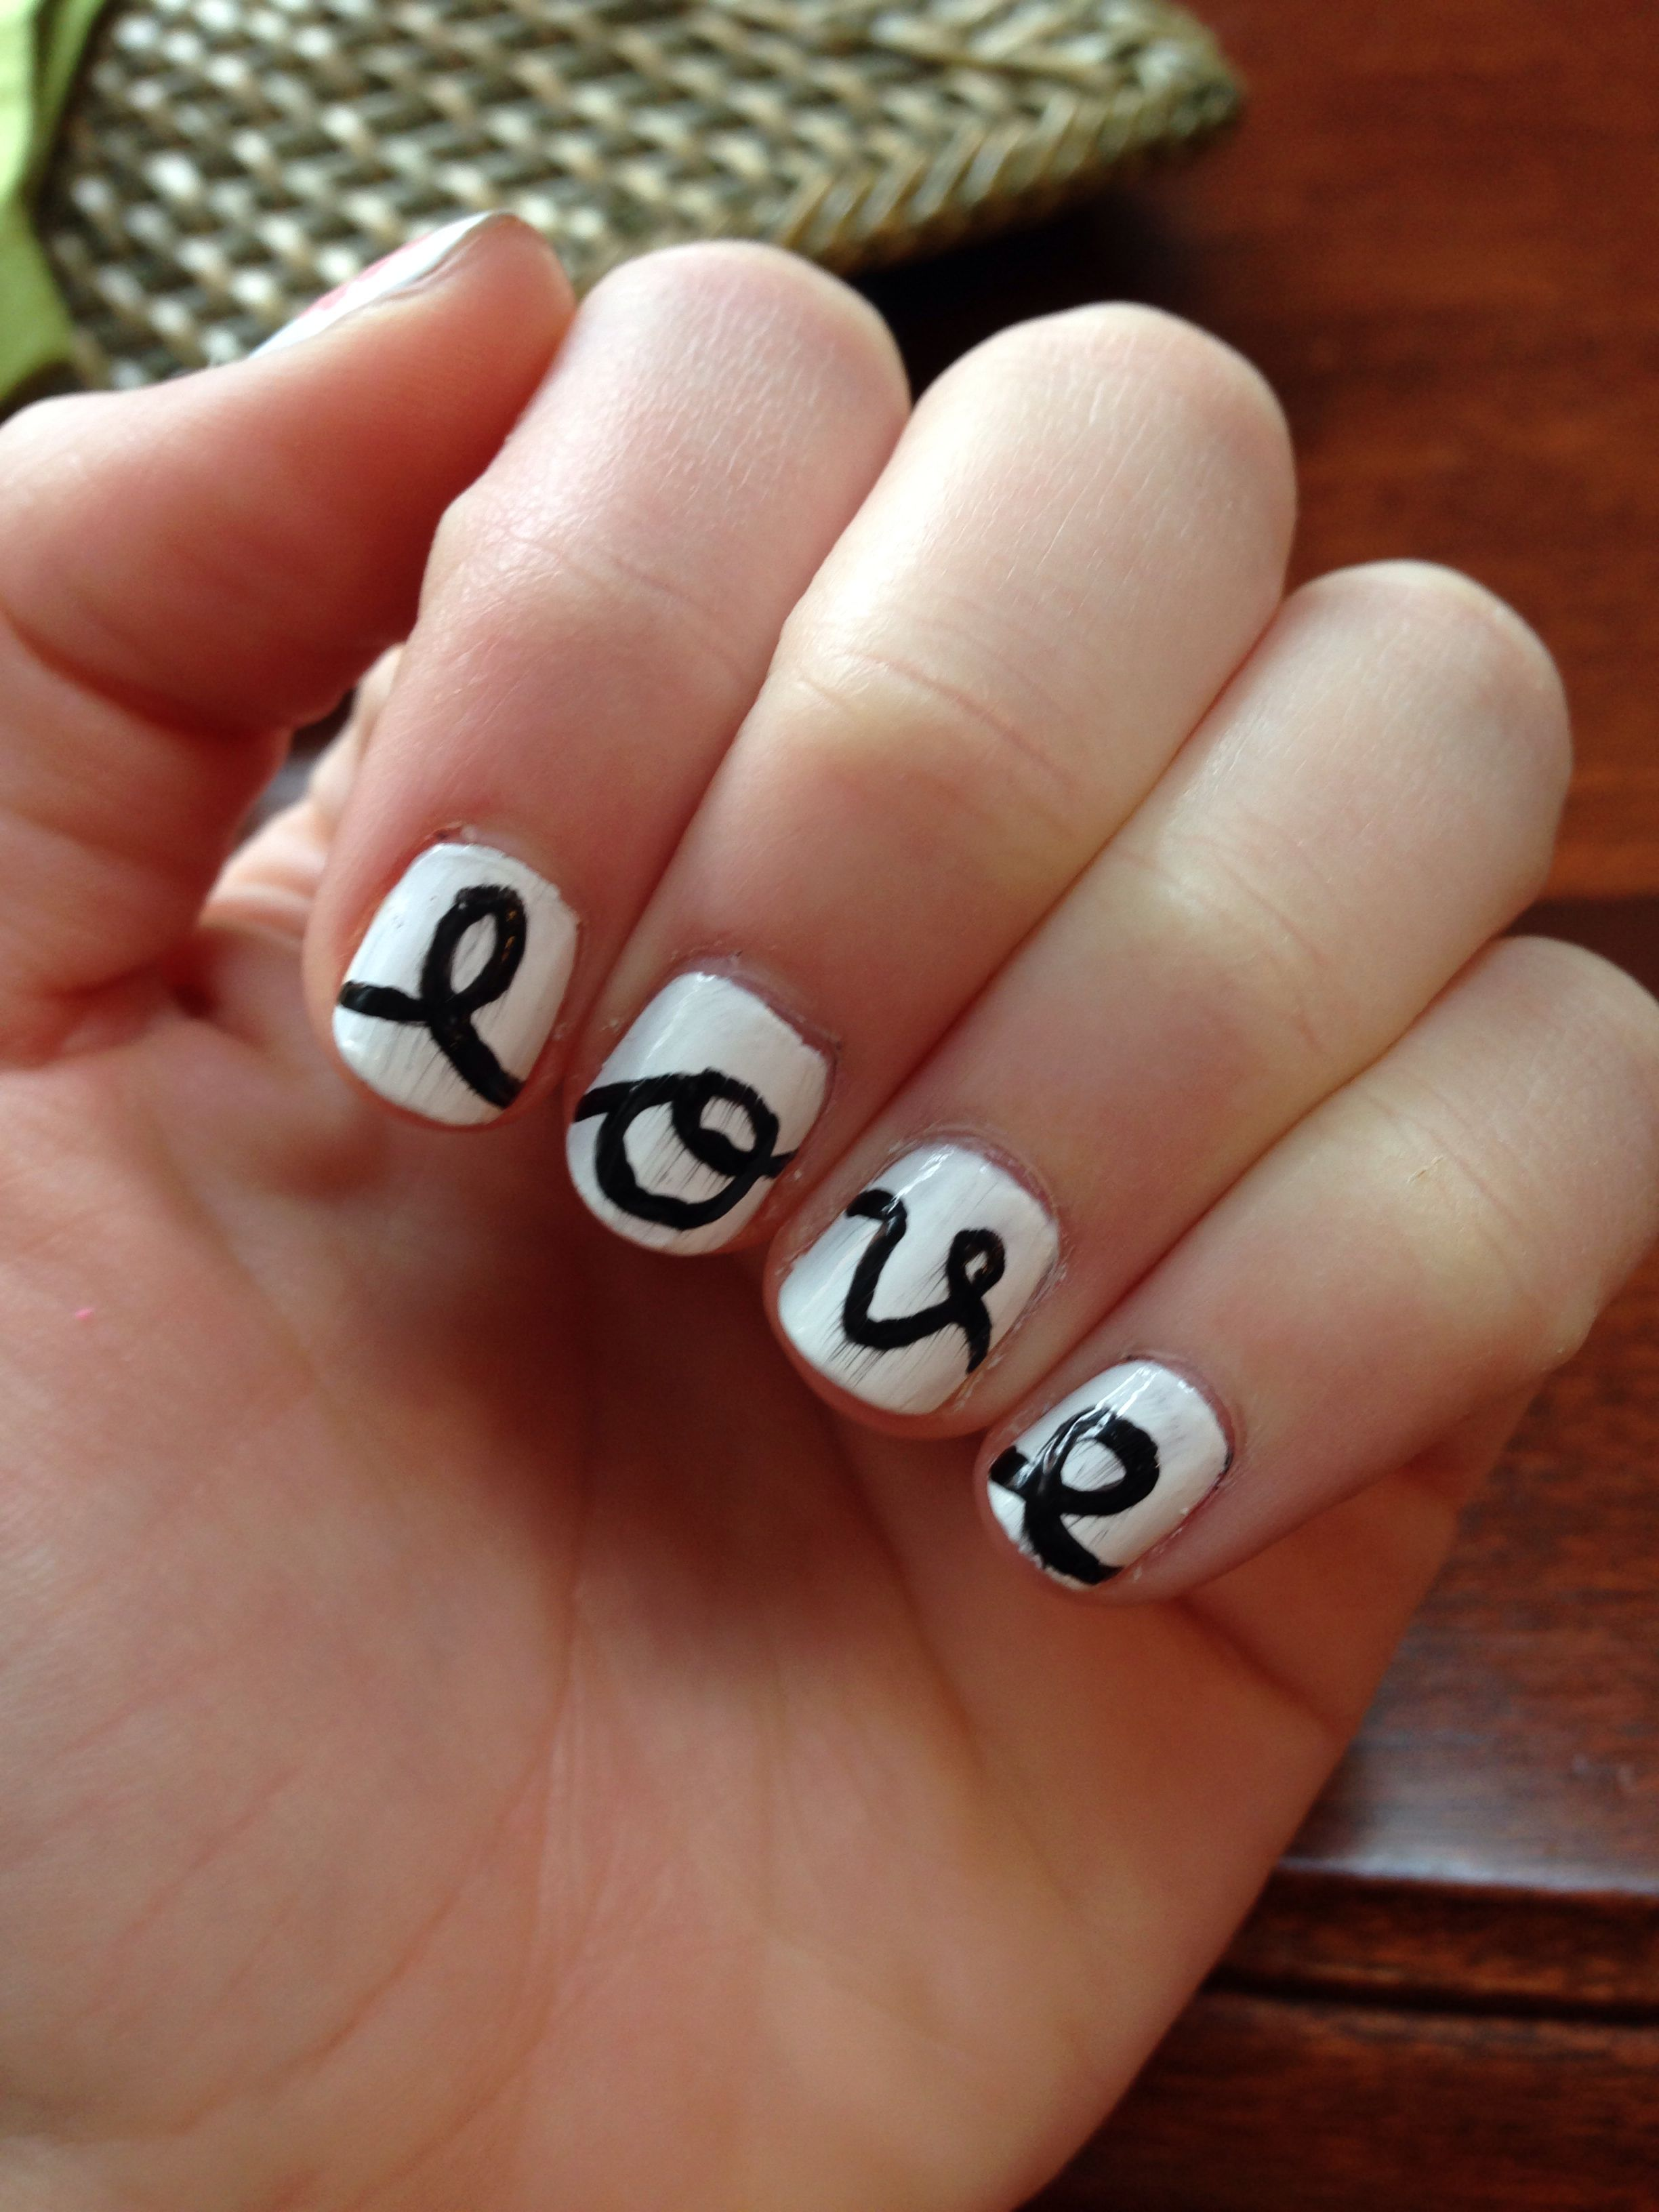 Love my love nails!! ;)